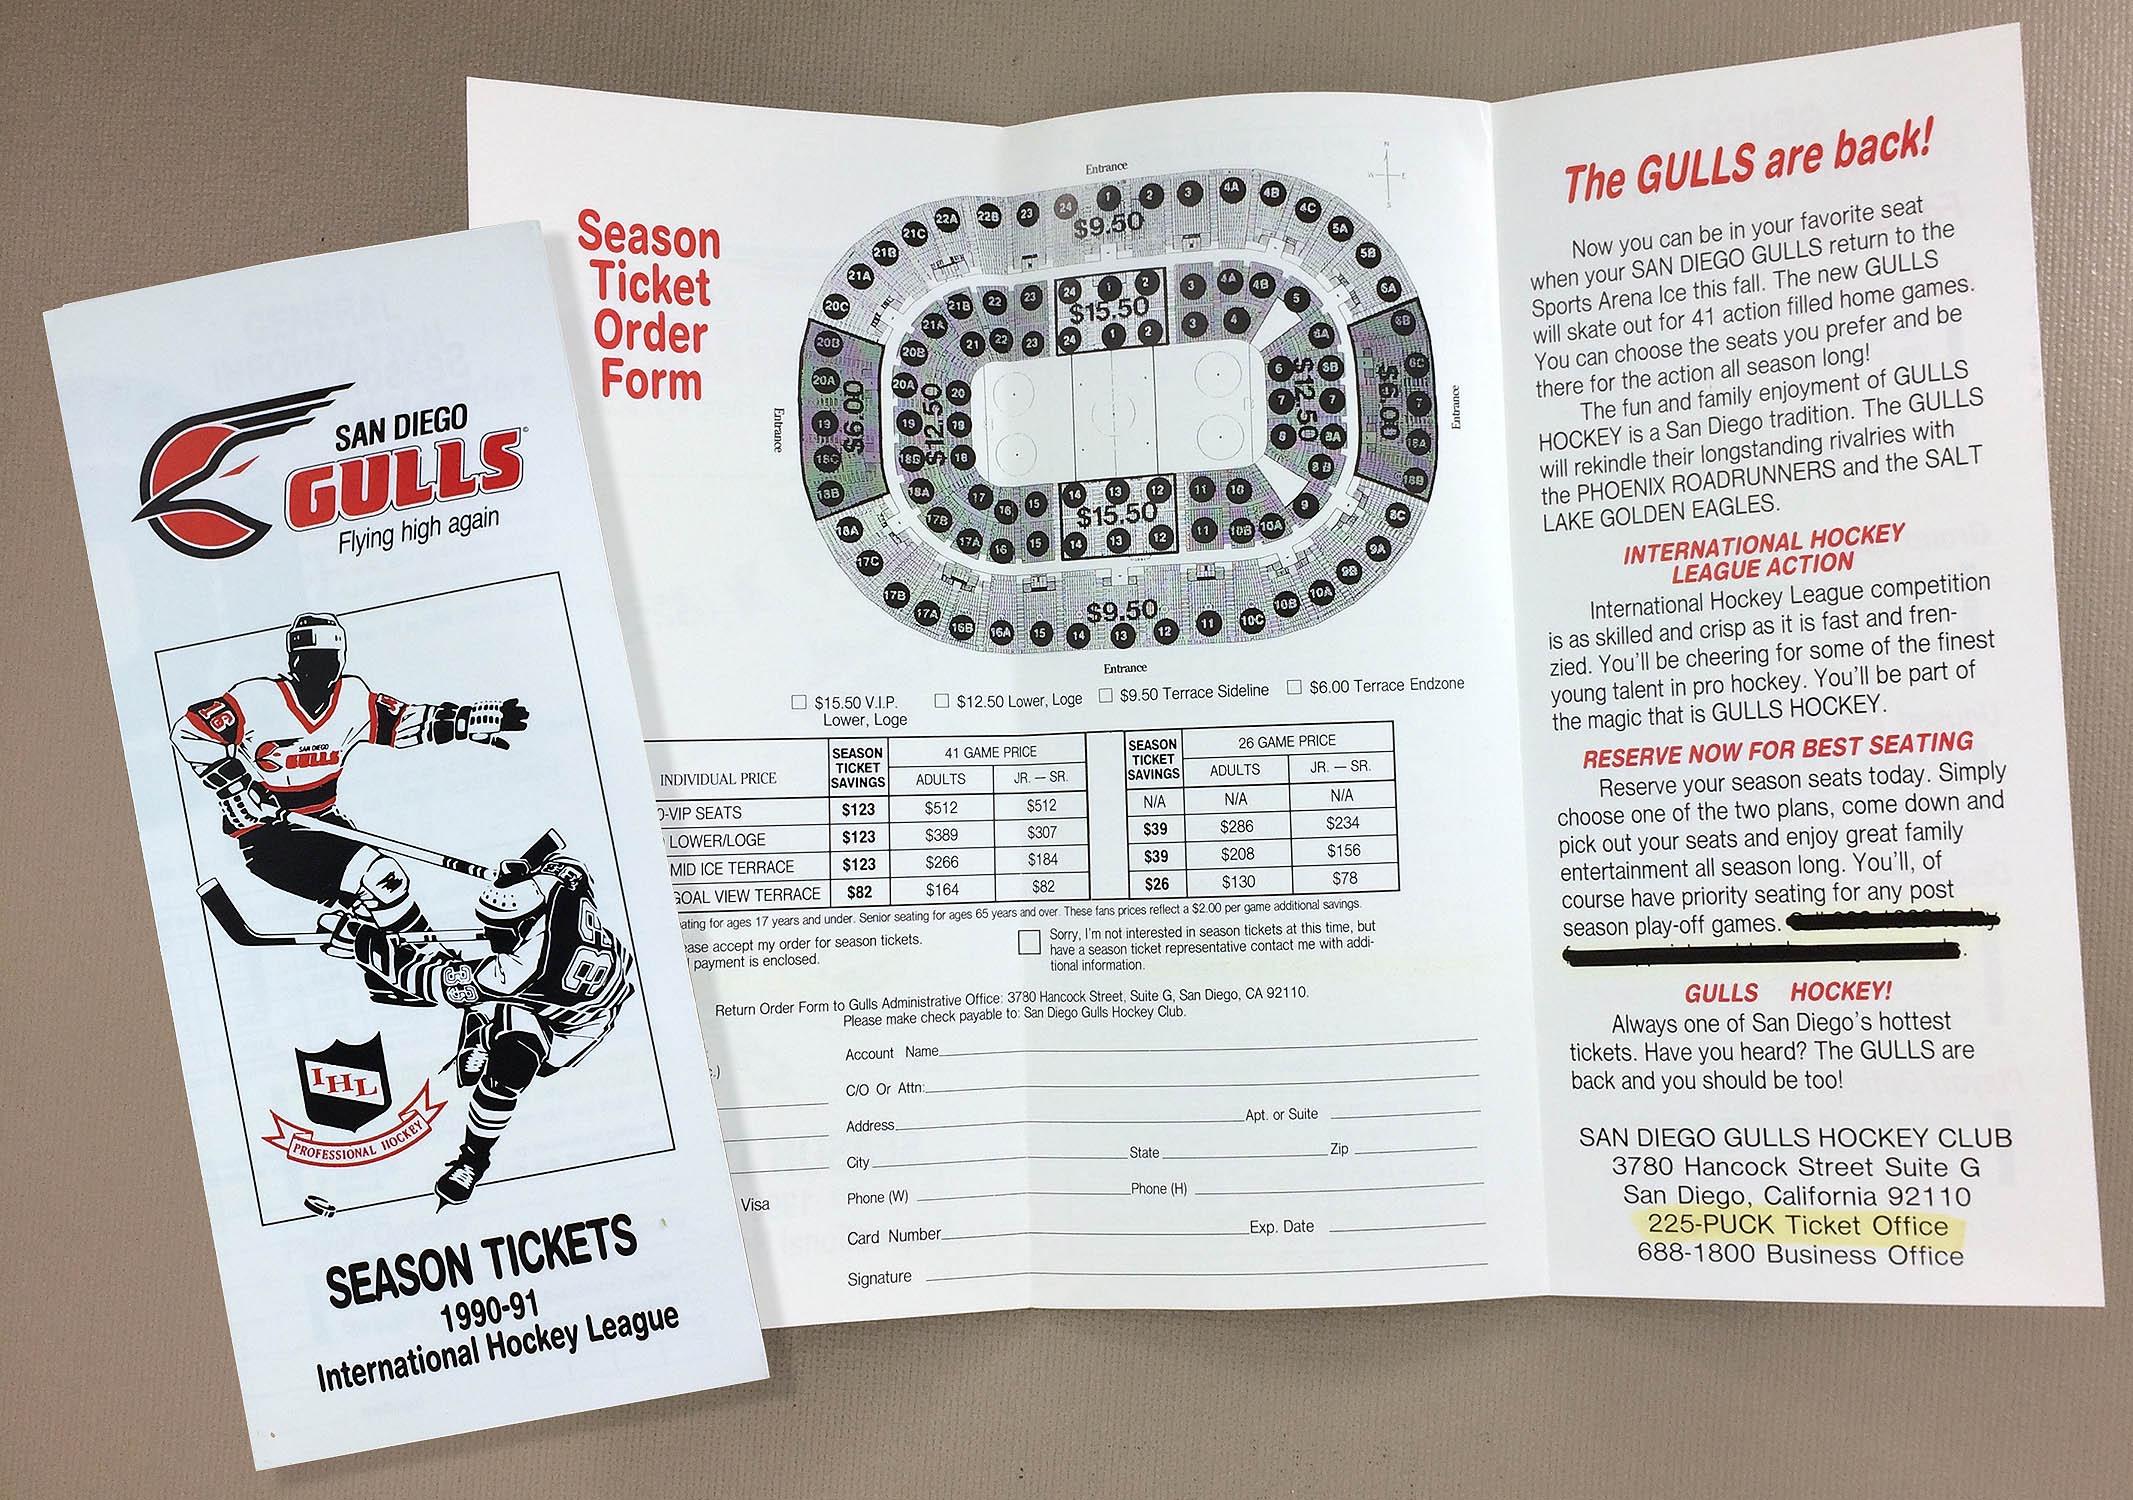 1990-91 San Diego Gulls Ticket Brochure